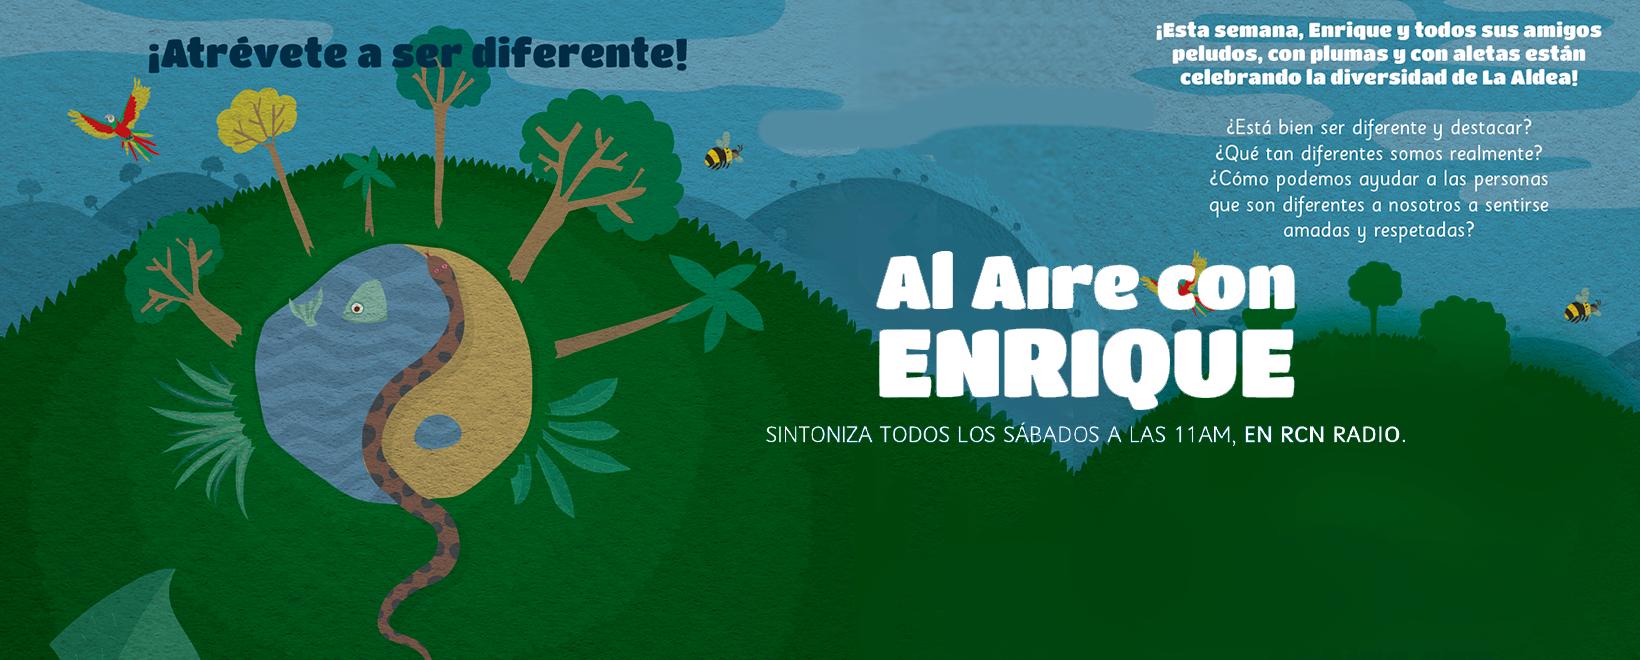 Al aire con Enrique- Capítulo 9: ¡Atrévete a ser diferente!